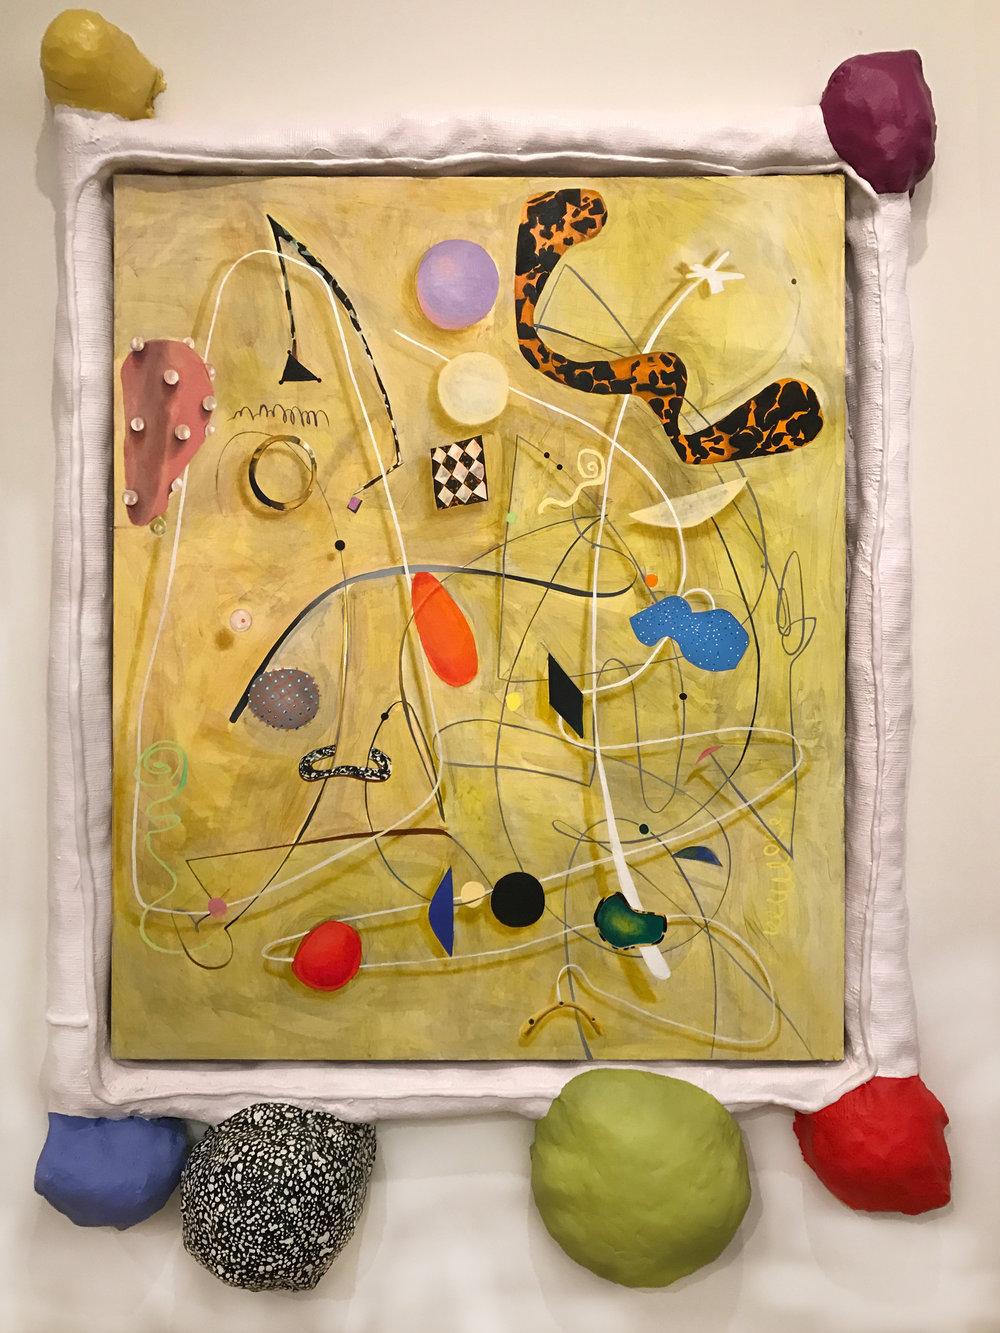 A Lived Thing II  oil, acrylic paint, foam, plaster, fiberglass, Apoxie Sculpt, canvas 70 x 68 x 5 in